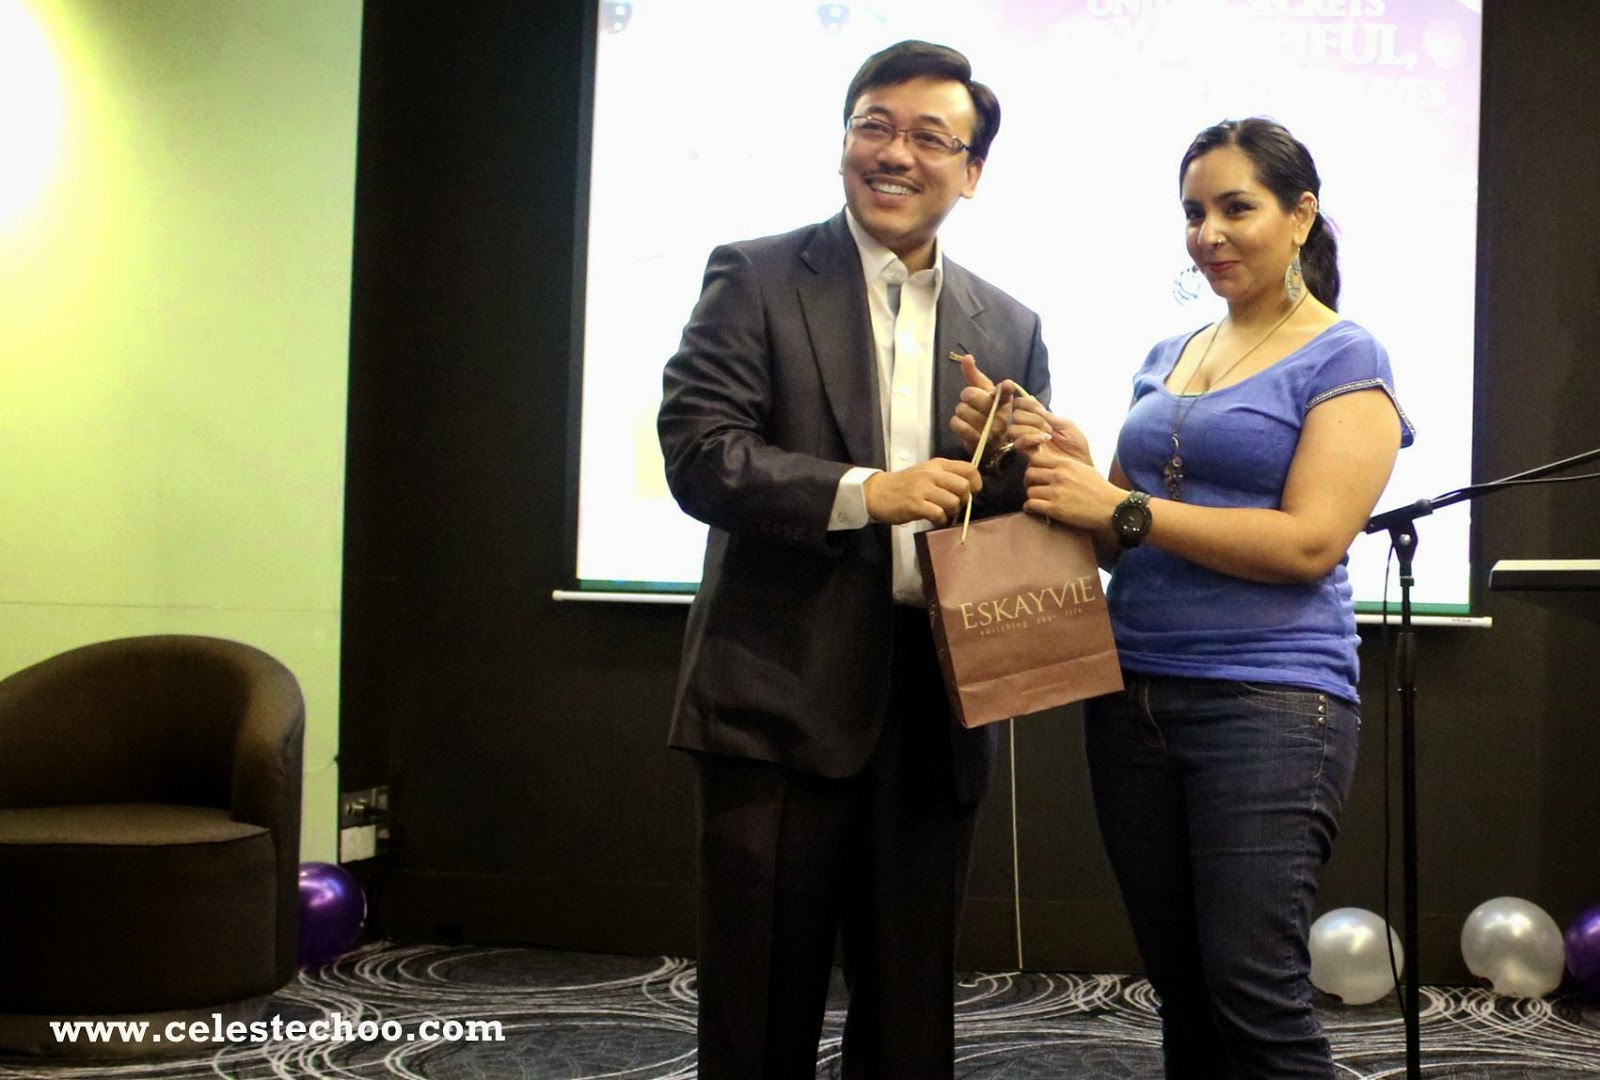 eskayvie_health_beauty_antiaging_blogger_event_winners